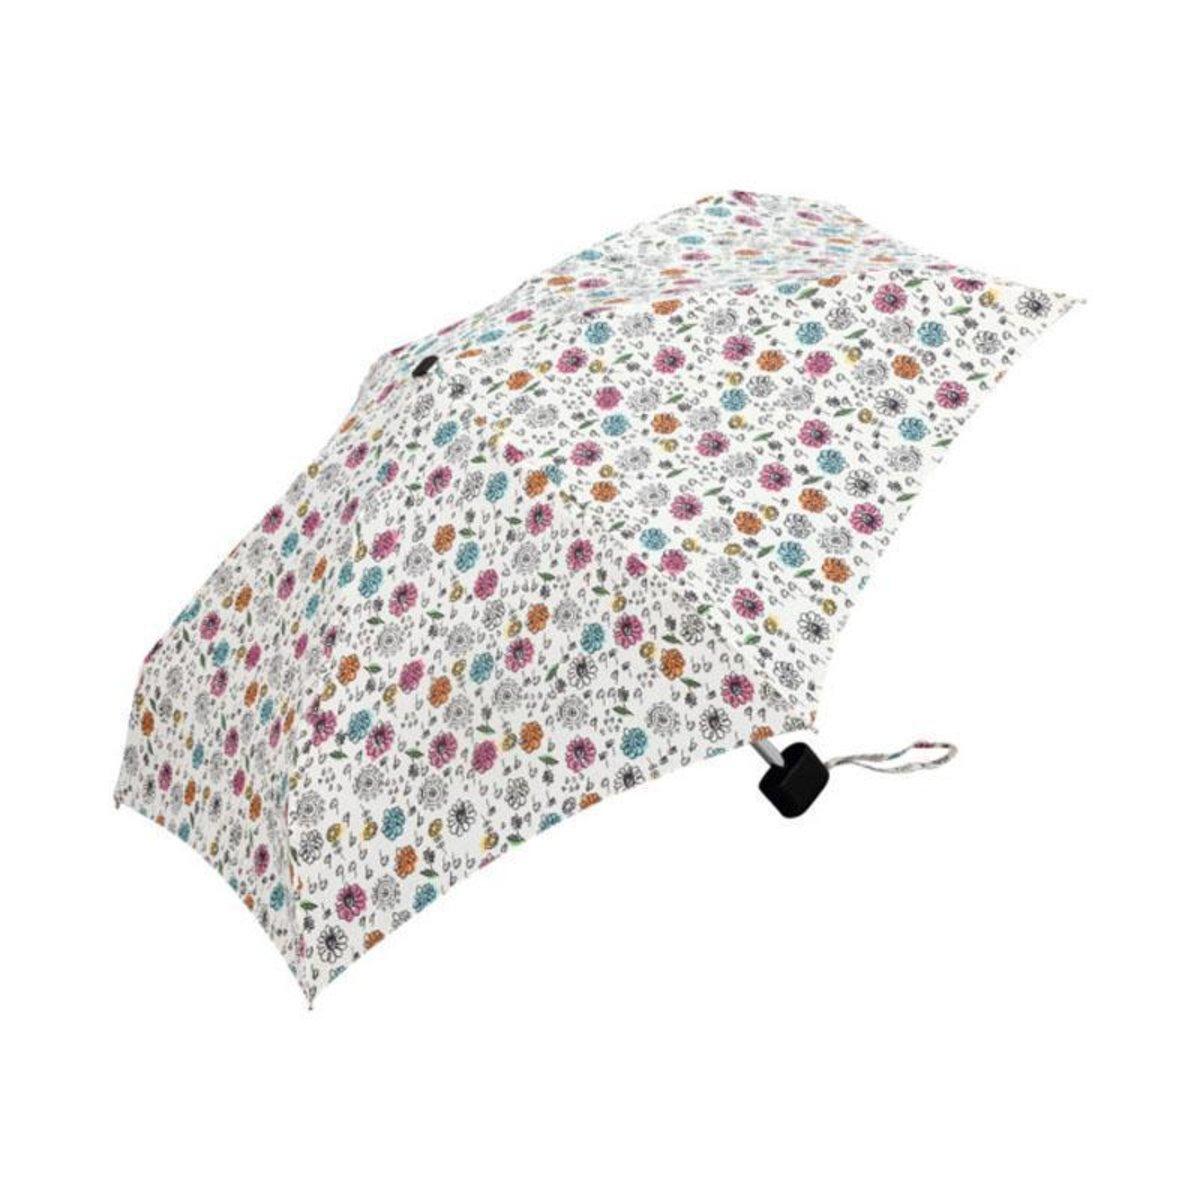 KiU Tiny Mini shifty cover anti-UV umbrella brand in Japan - Painted Flower Graffiti Flower